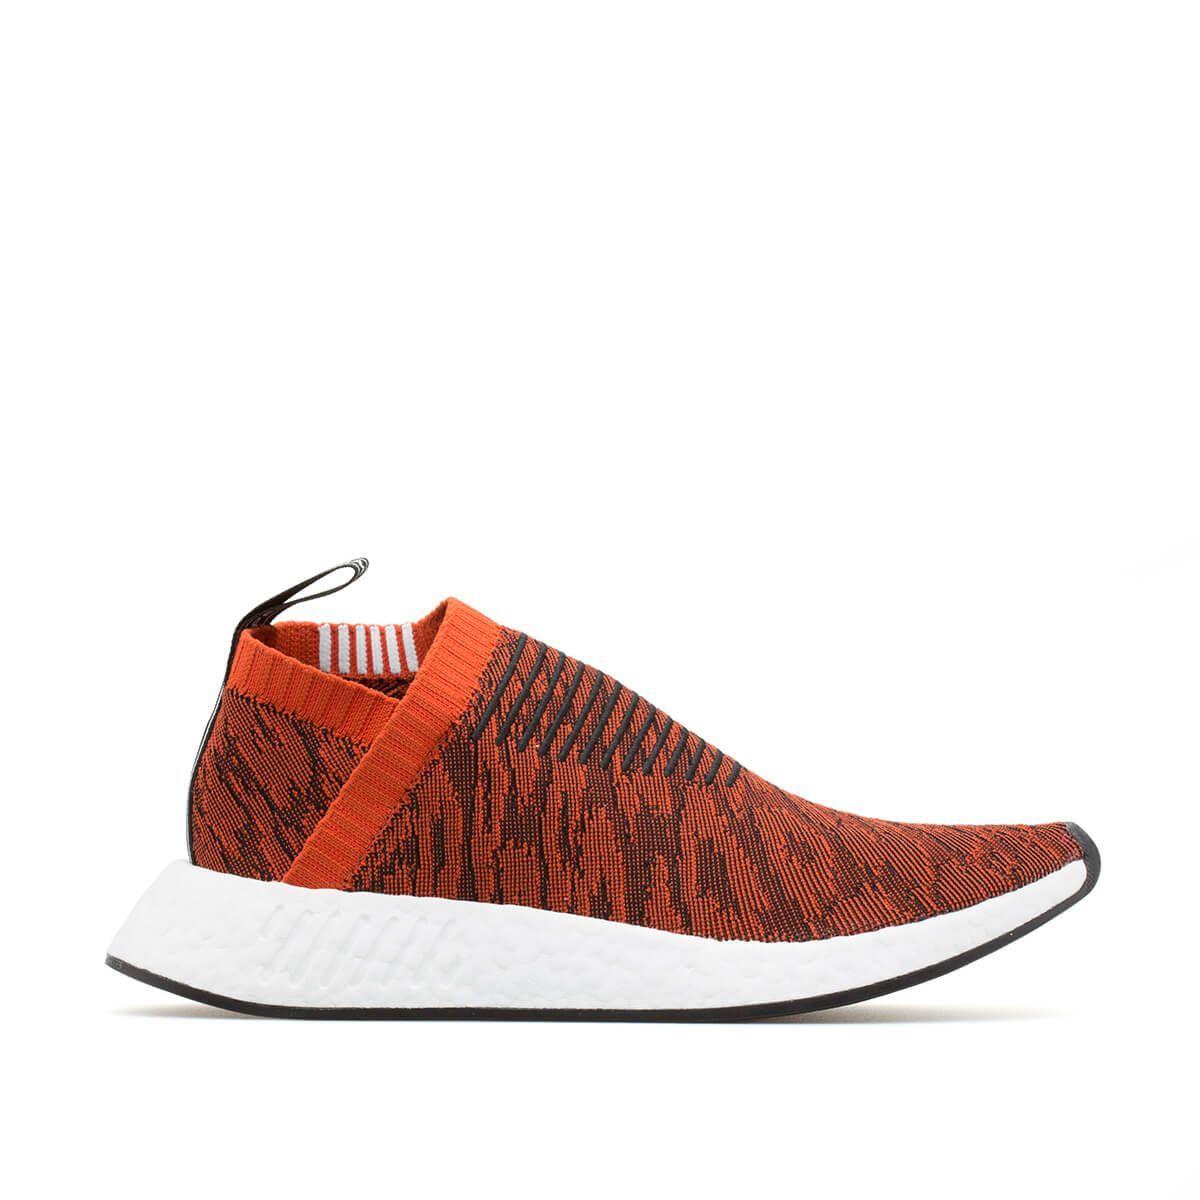 ADIDAS ORIGINALS NMD CS2 adidasoriginals Chaussures Adidas